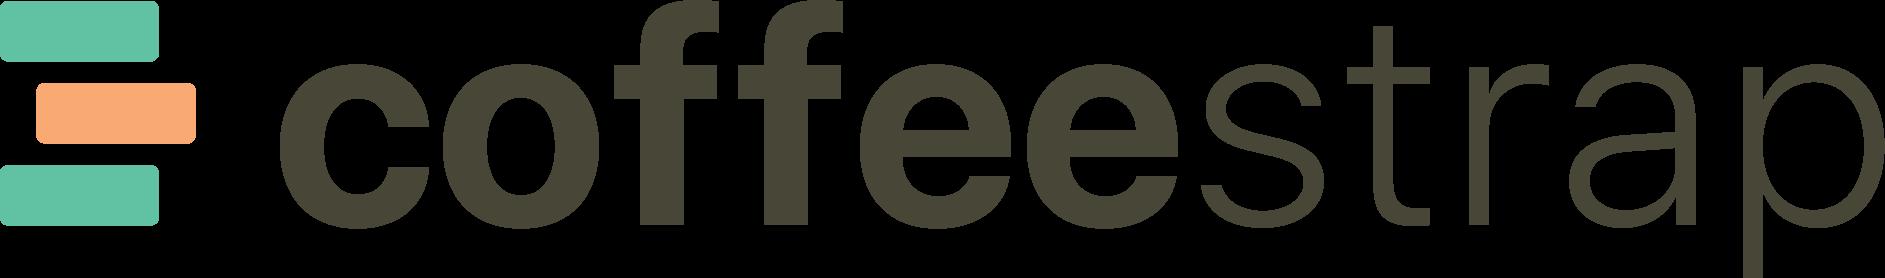 coffeestrap logo